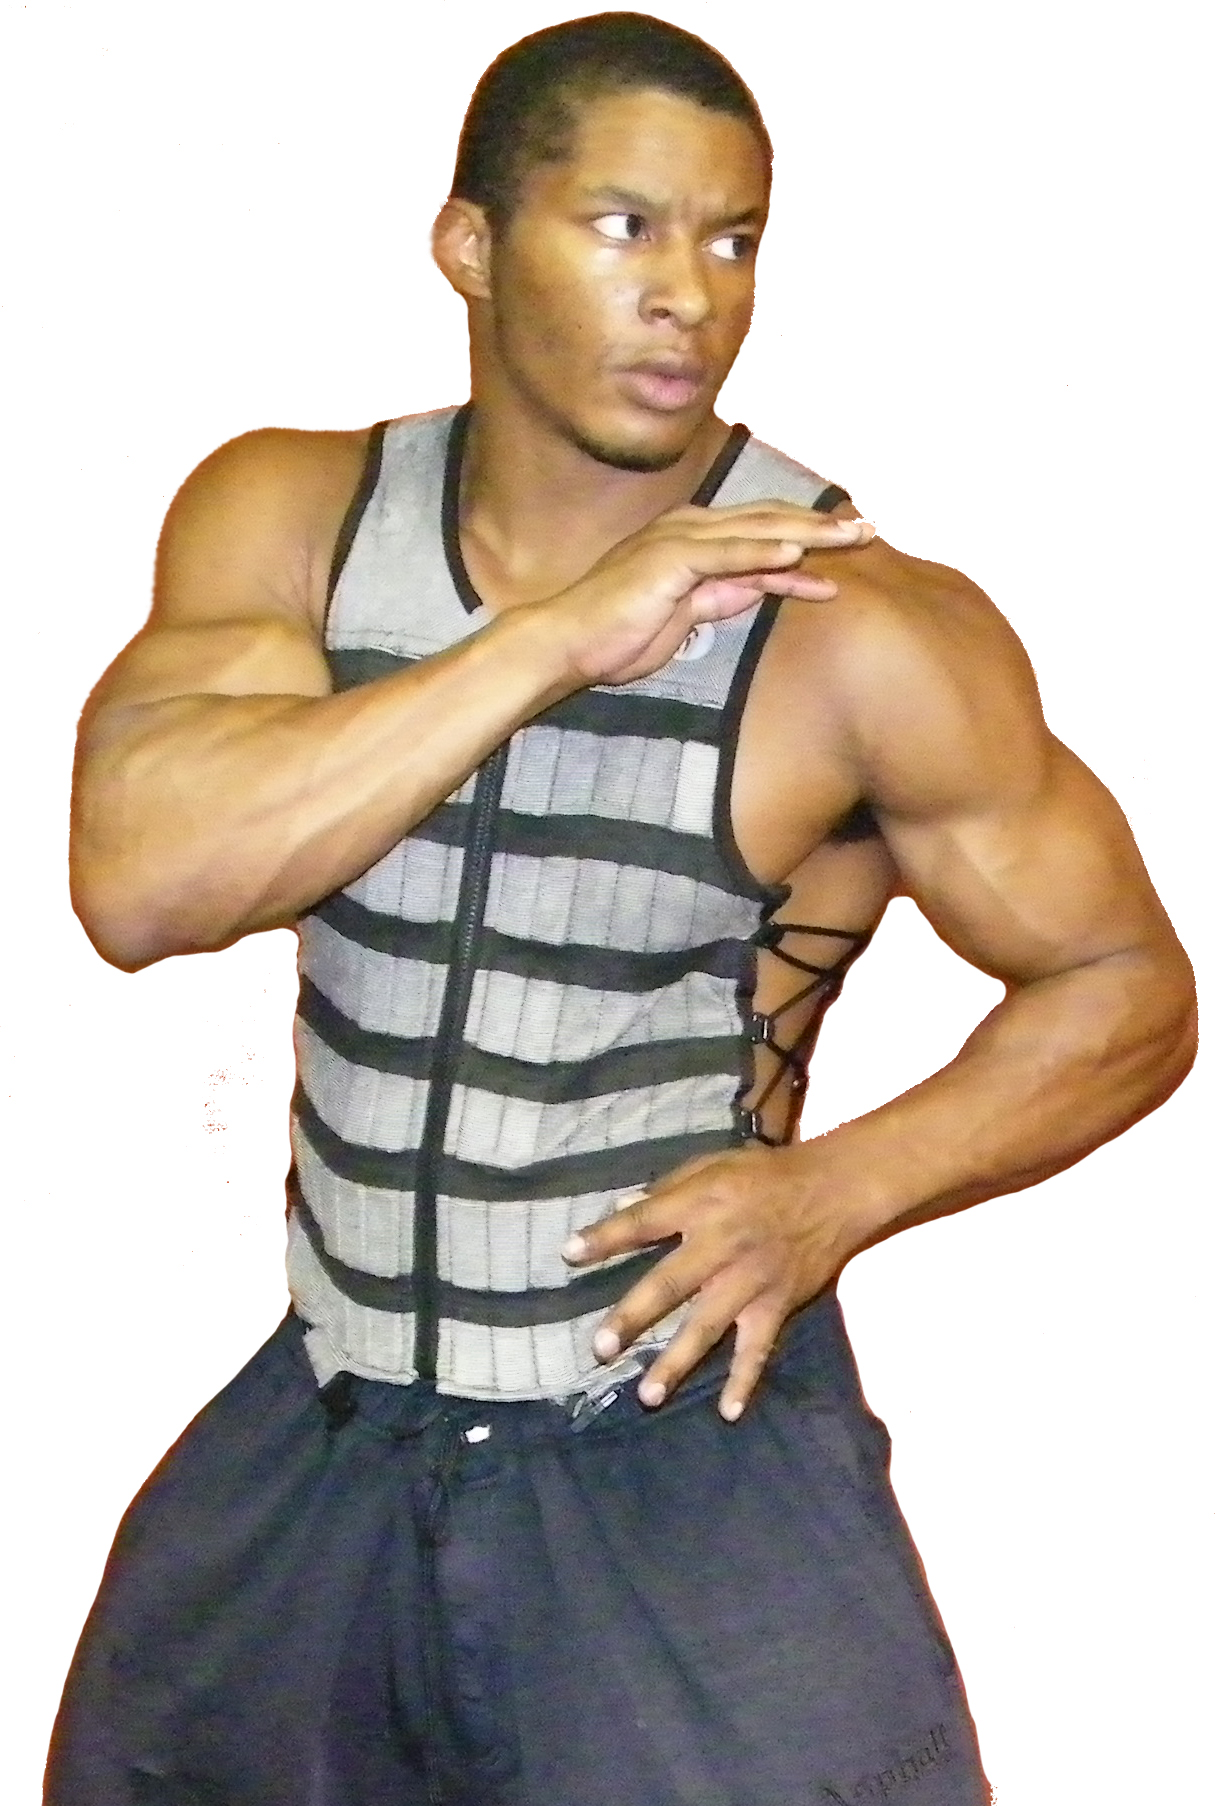 Water Board Sports >> Hyper Wear Receives Angel Investment |FinSMEs